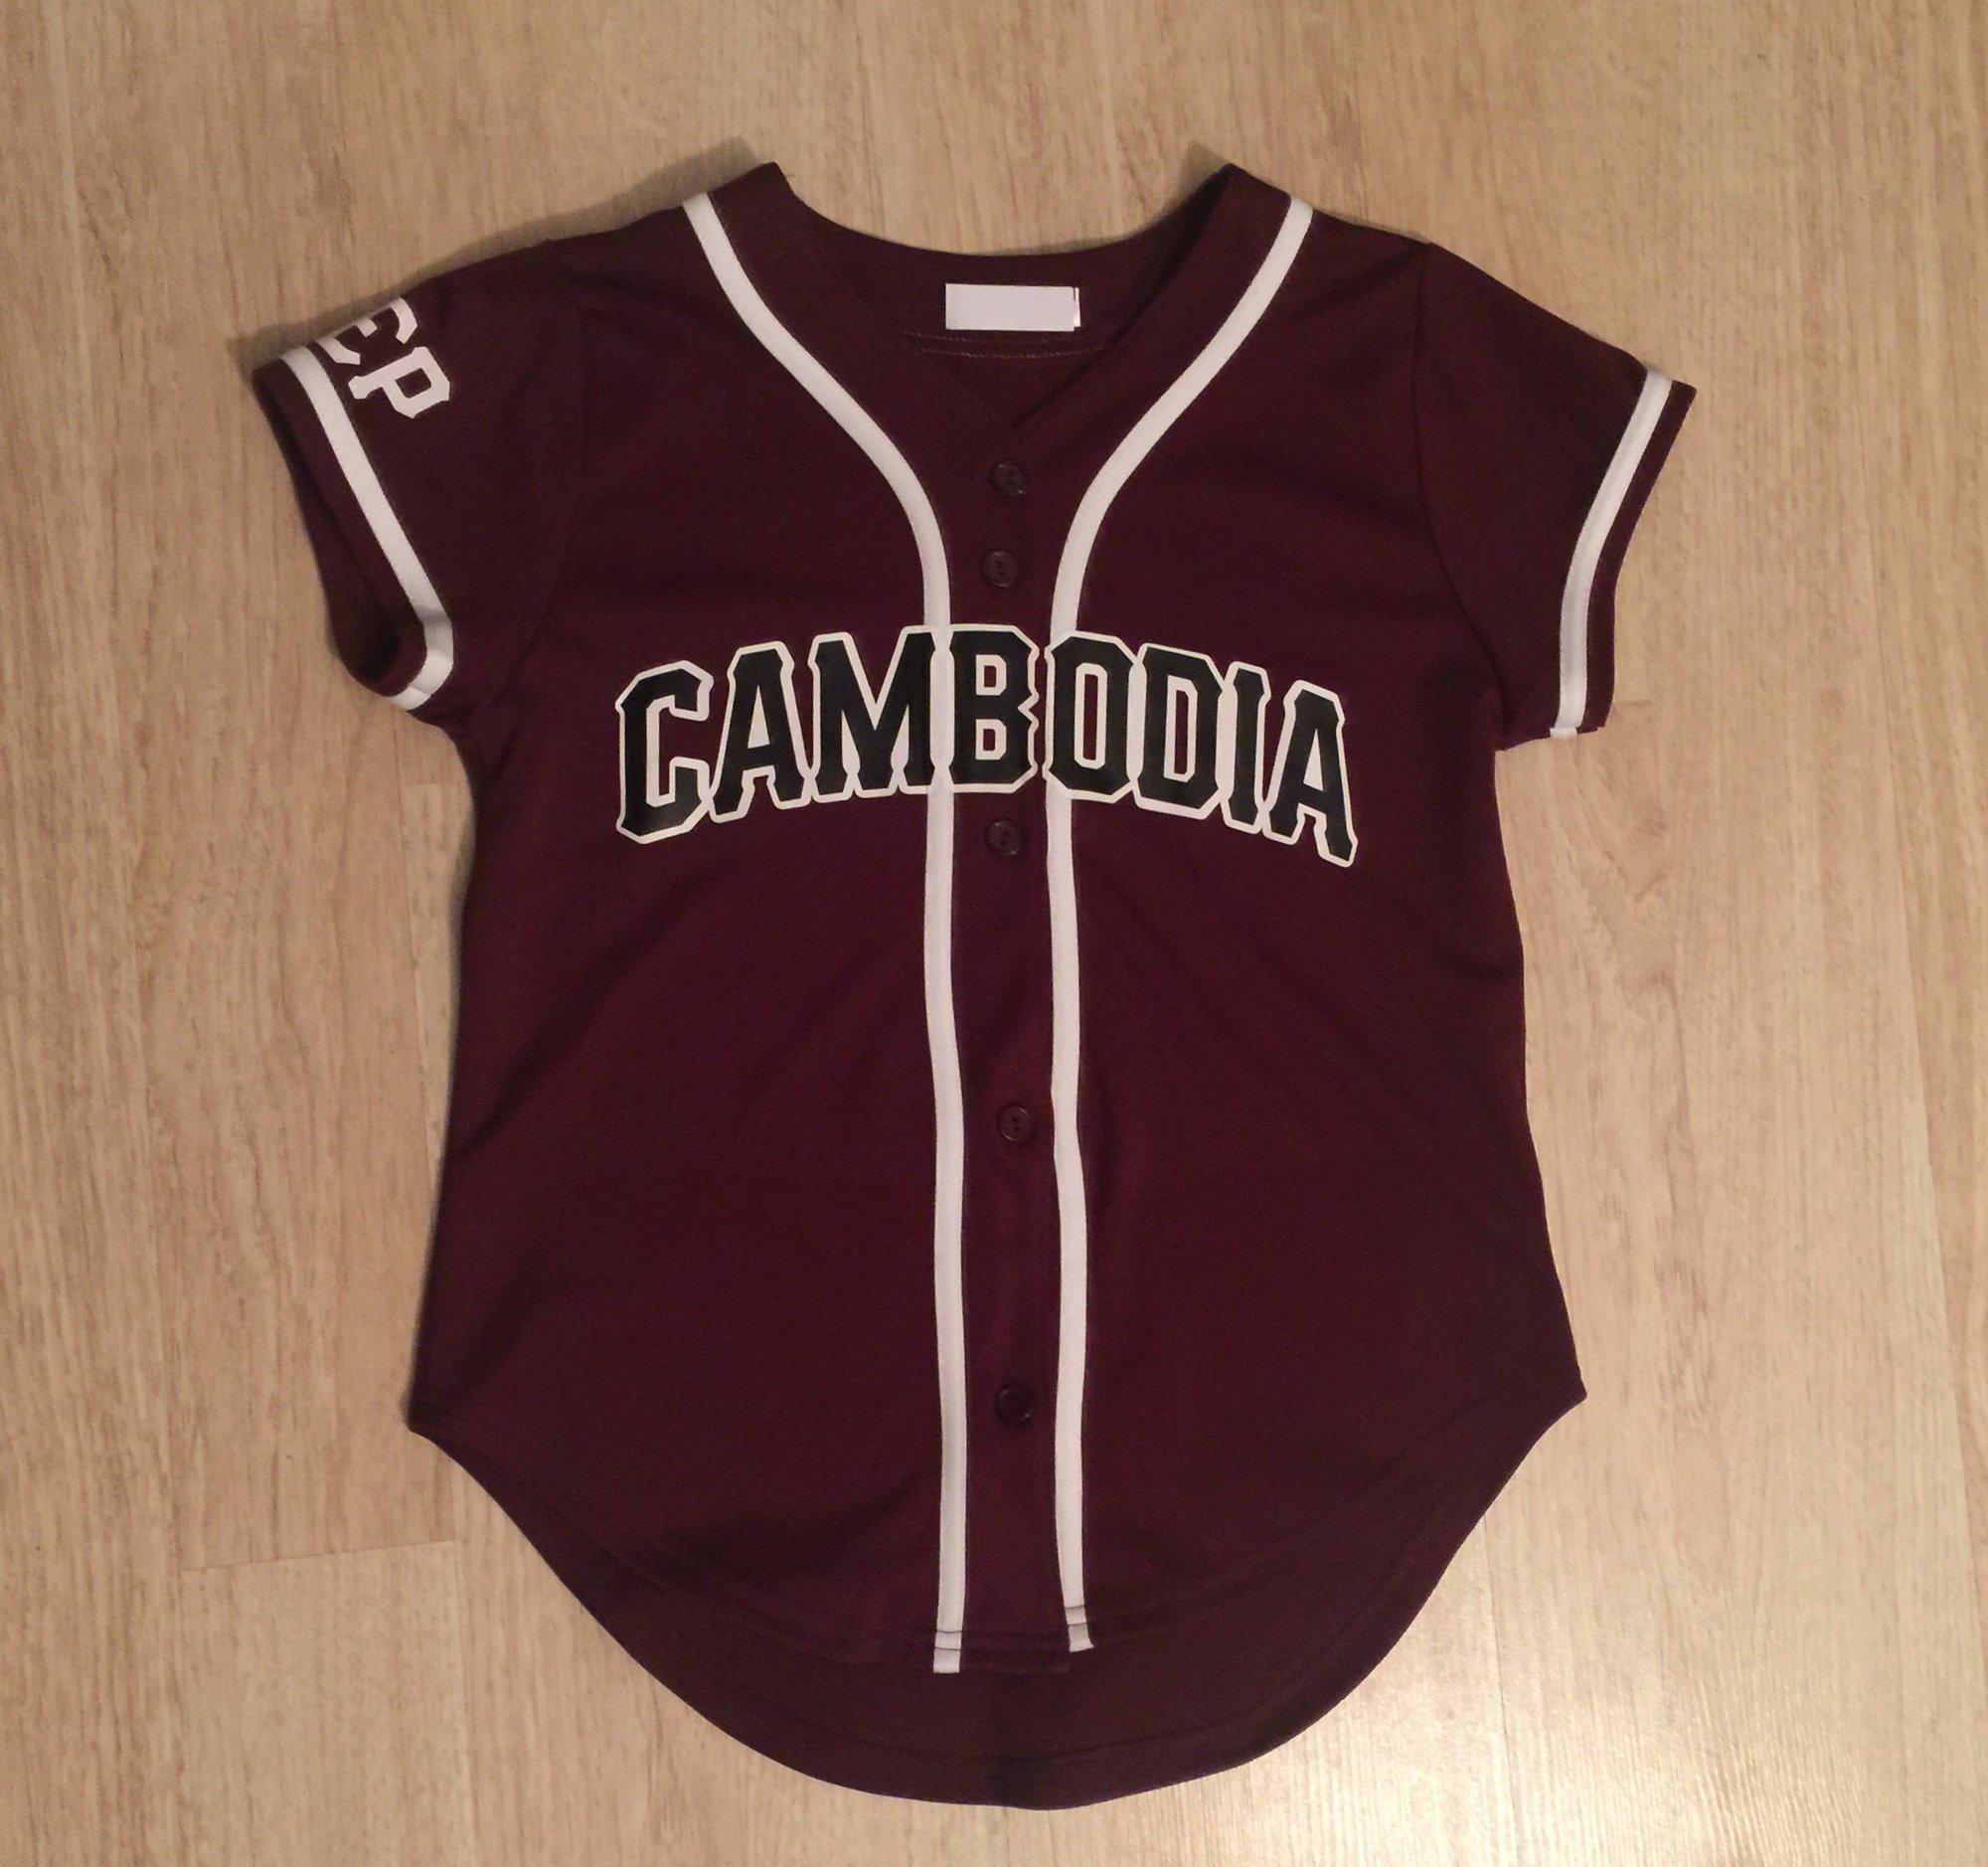 Rep Cambodia — REP CAMBODIA WOMEN BASEBALL JERSEYS 14172d509